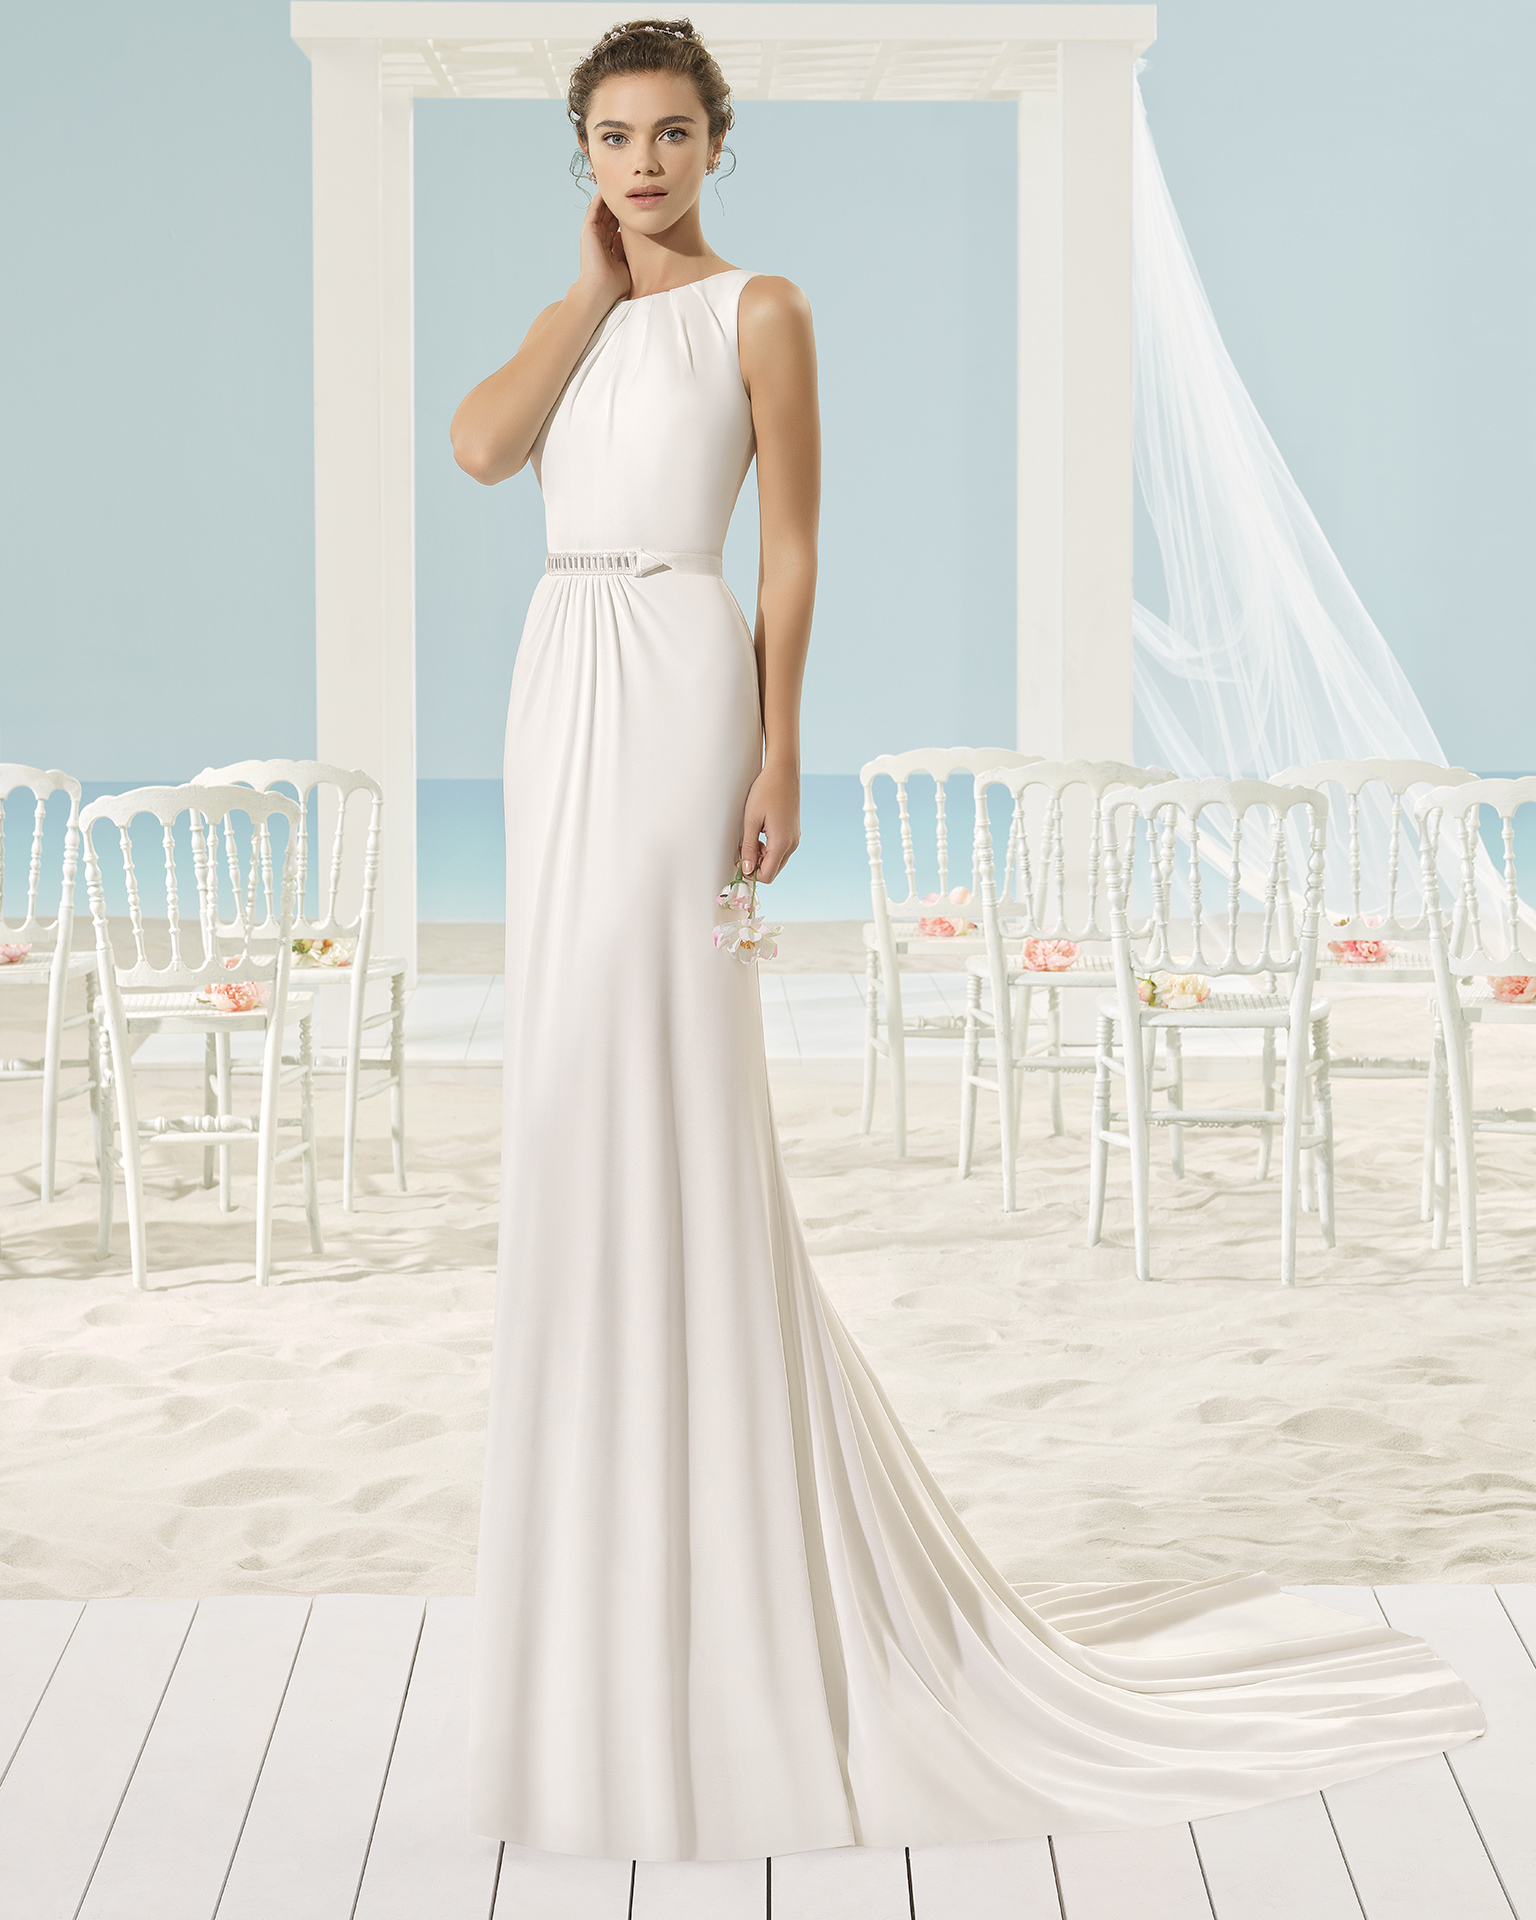 XIMEI Brautkleid Aire Barcelona Beach Wedding 2017